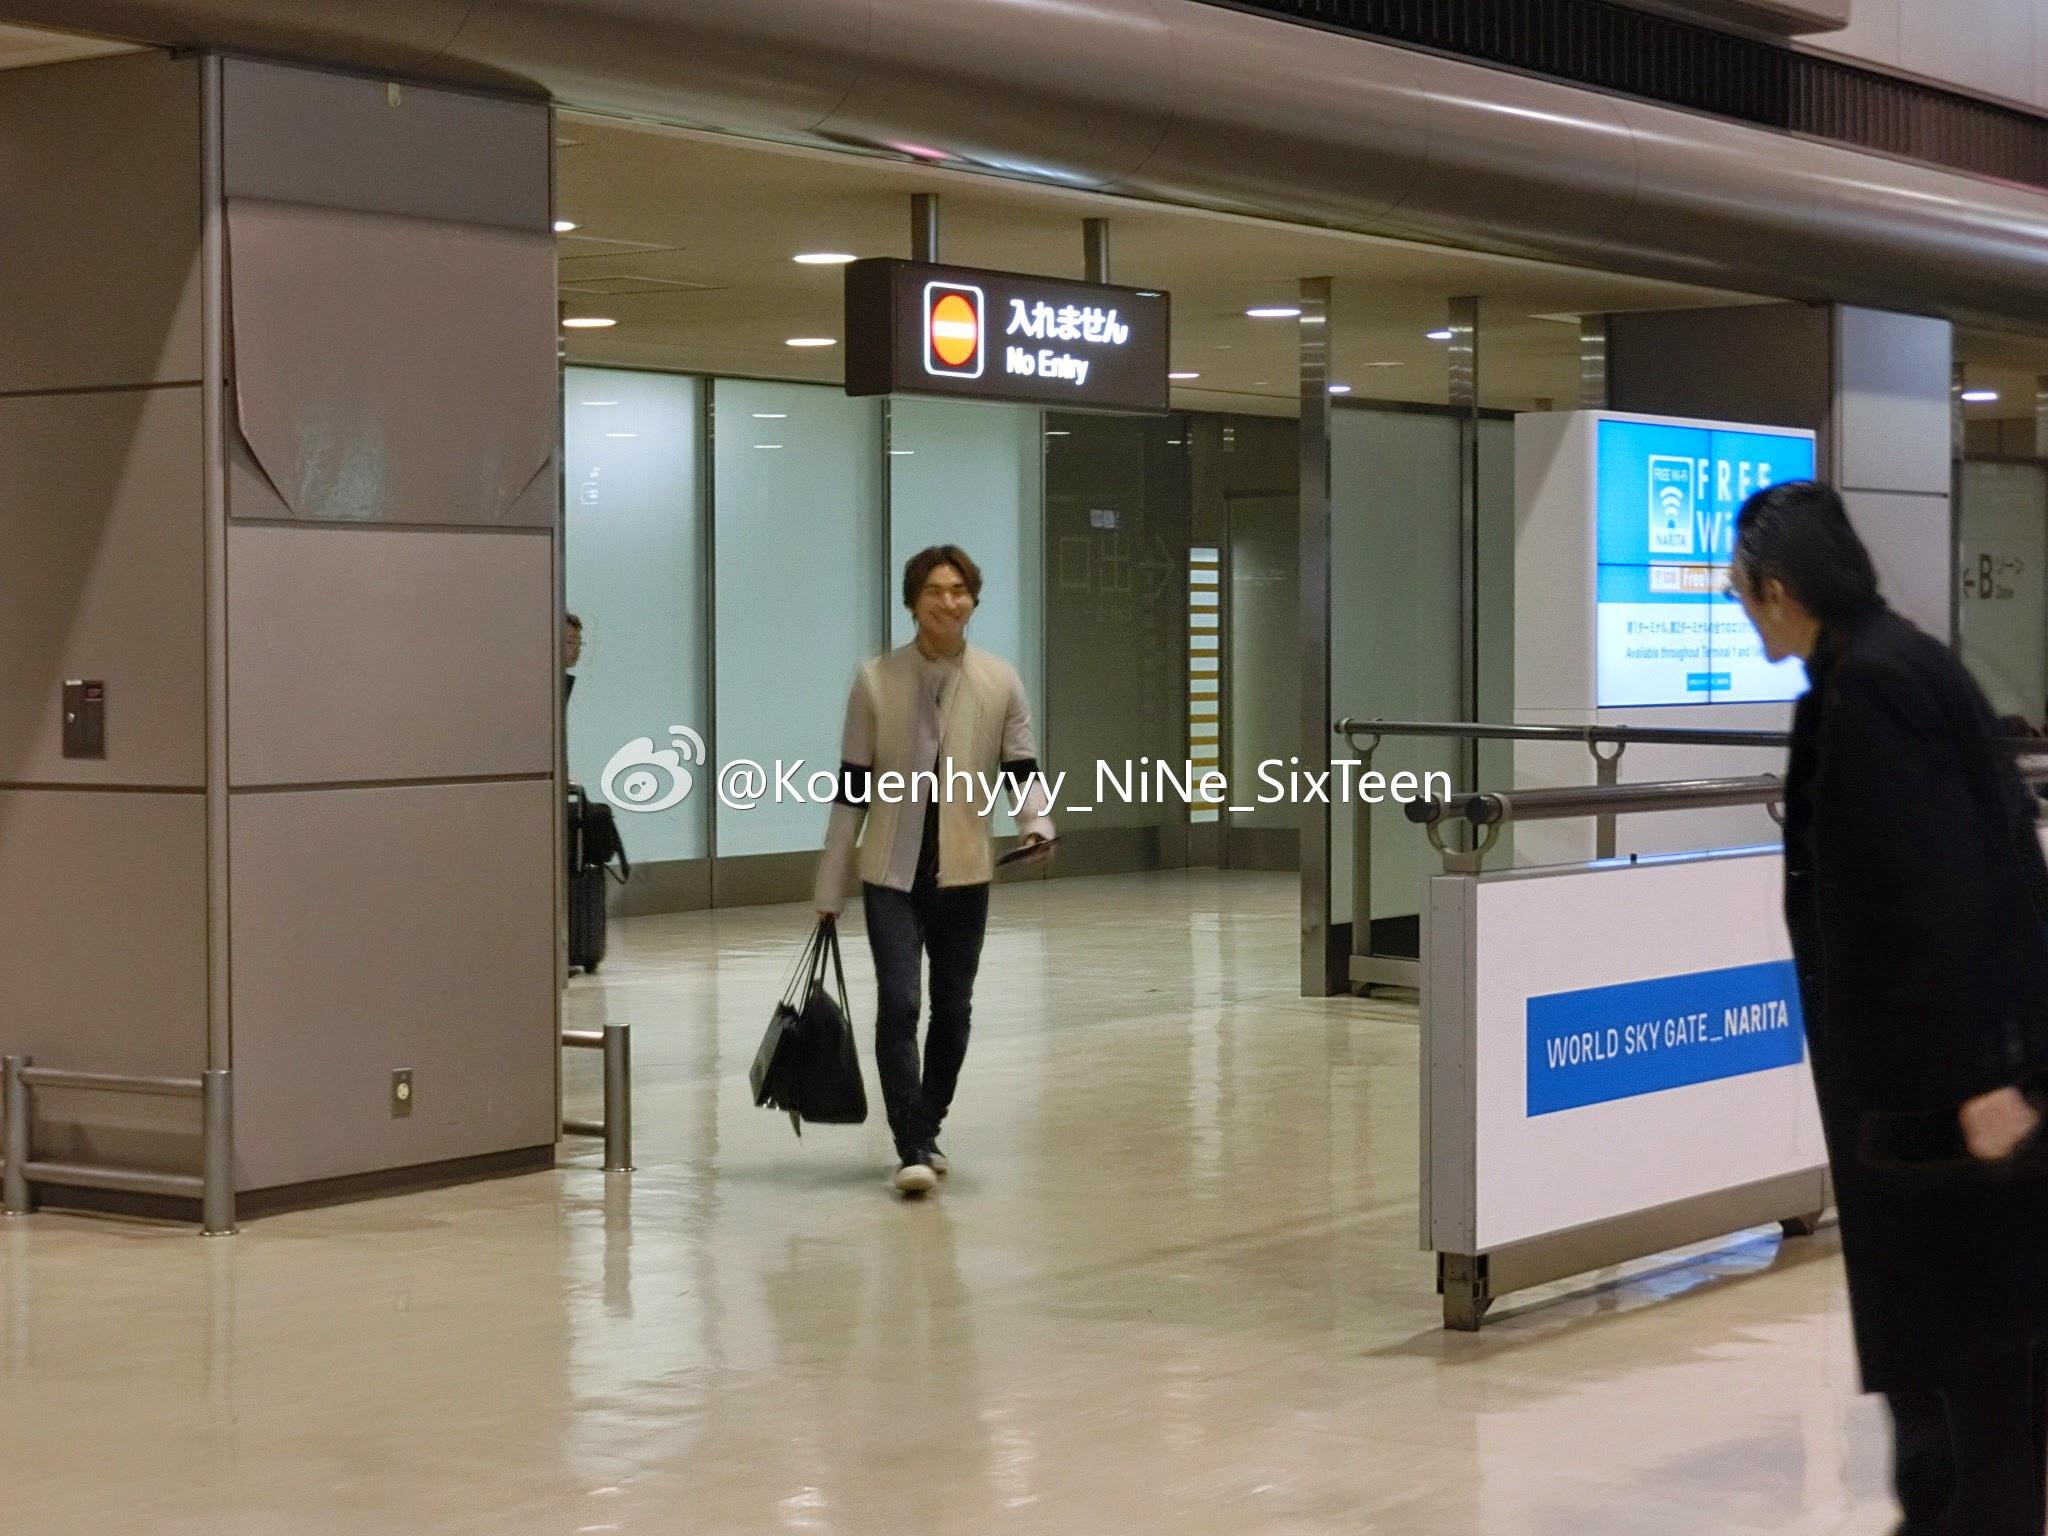 Dae Sung - Narita Airport - 31jan2015 - Kouenhyyy_NiNe_SixTeen - 01.jpg